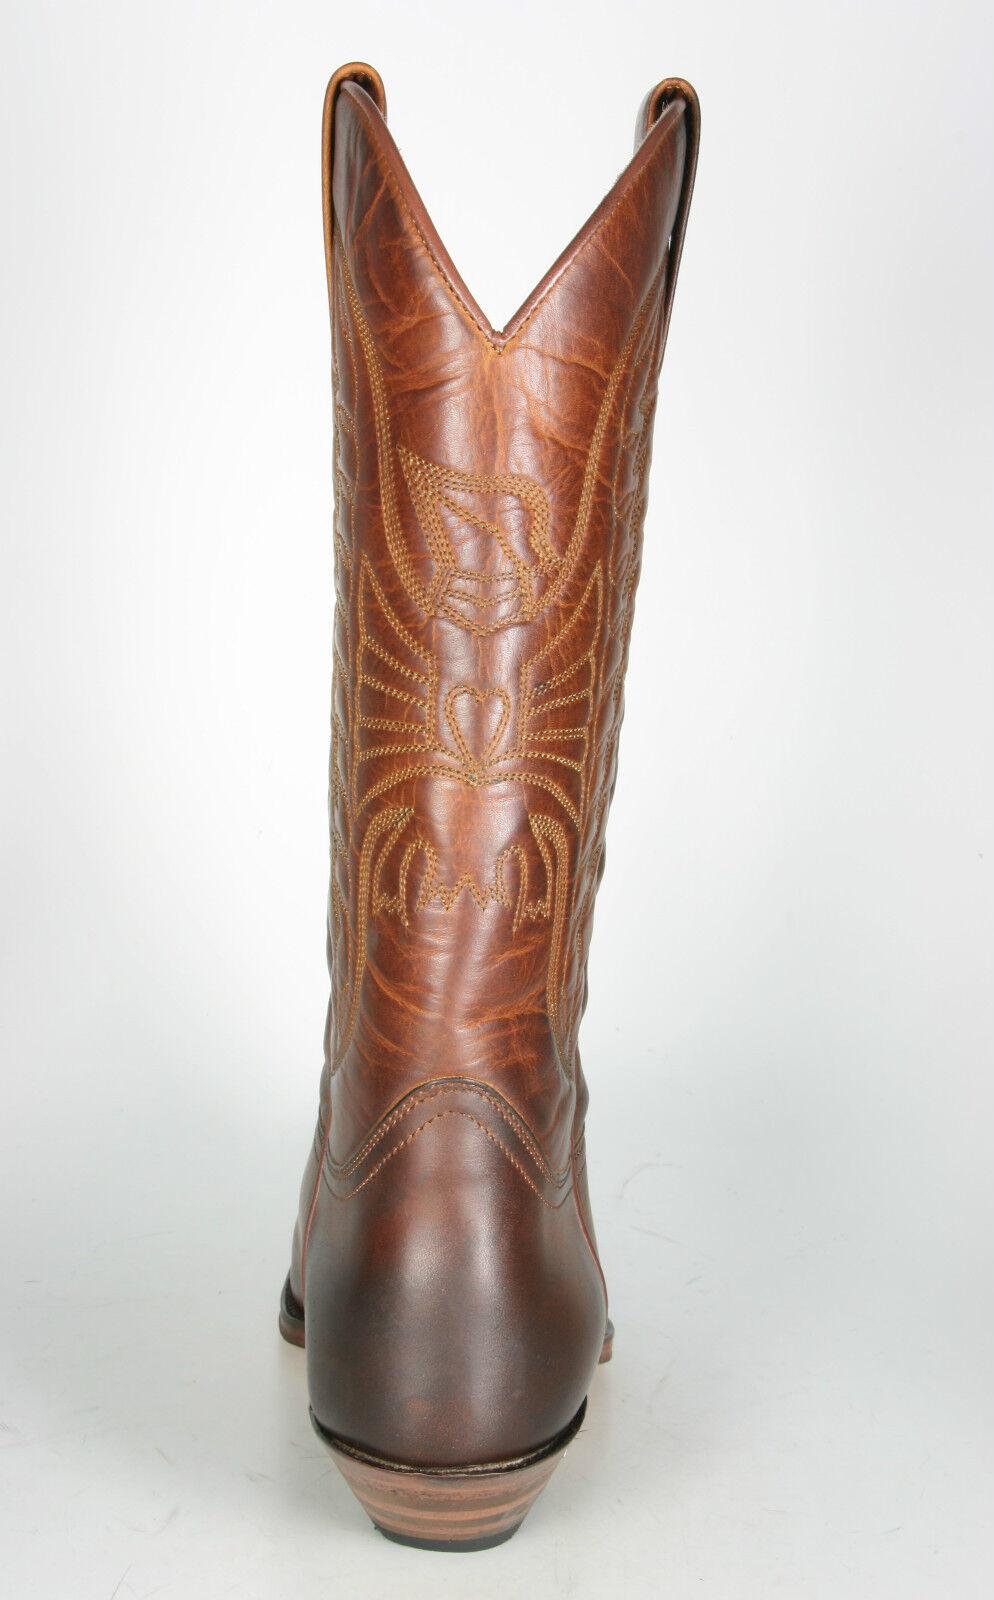 2073 Sendra Boots Cowboystiefel Evolution Rahmengenähte Lederstiefel